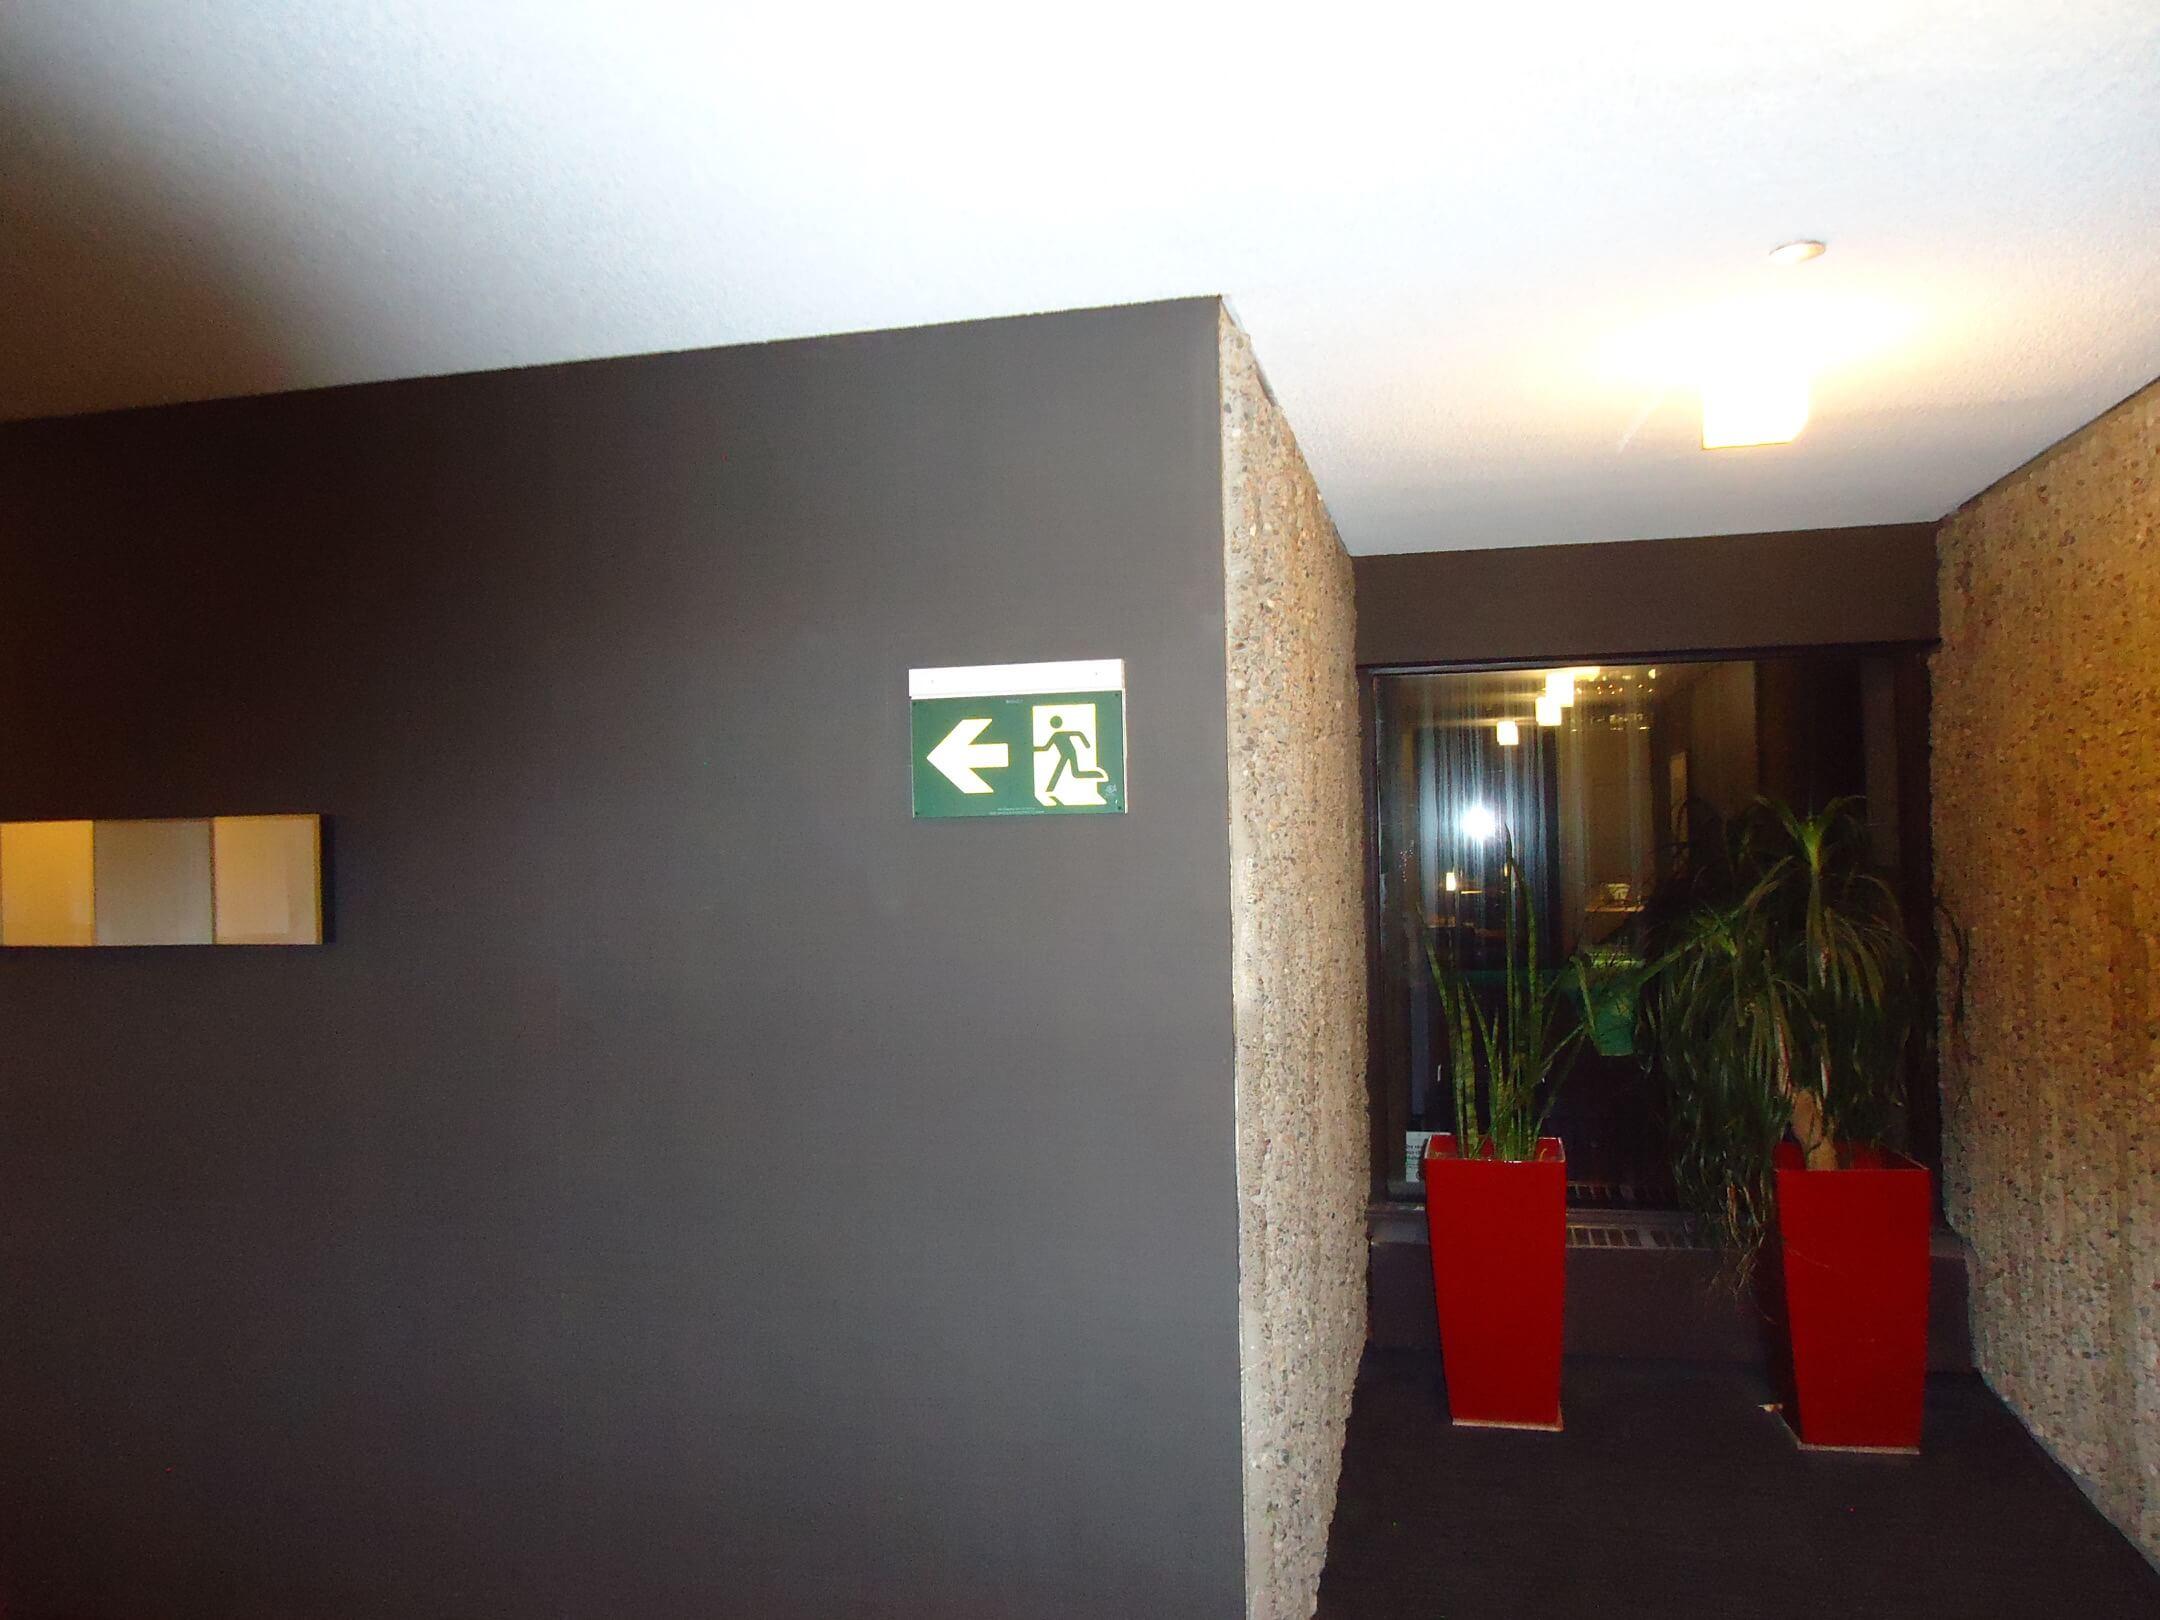 ecoglo exit signs - kinesik